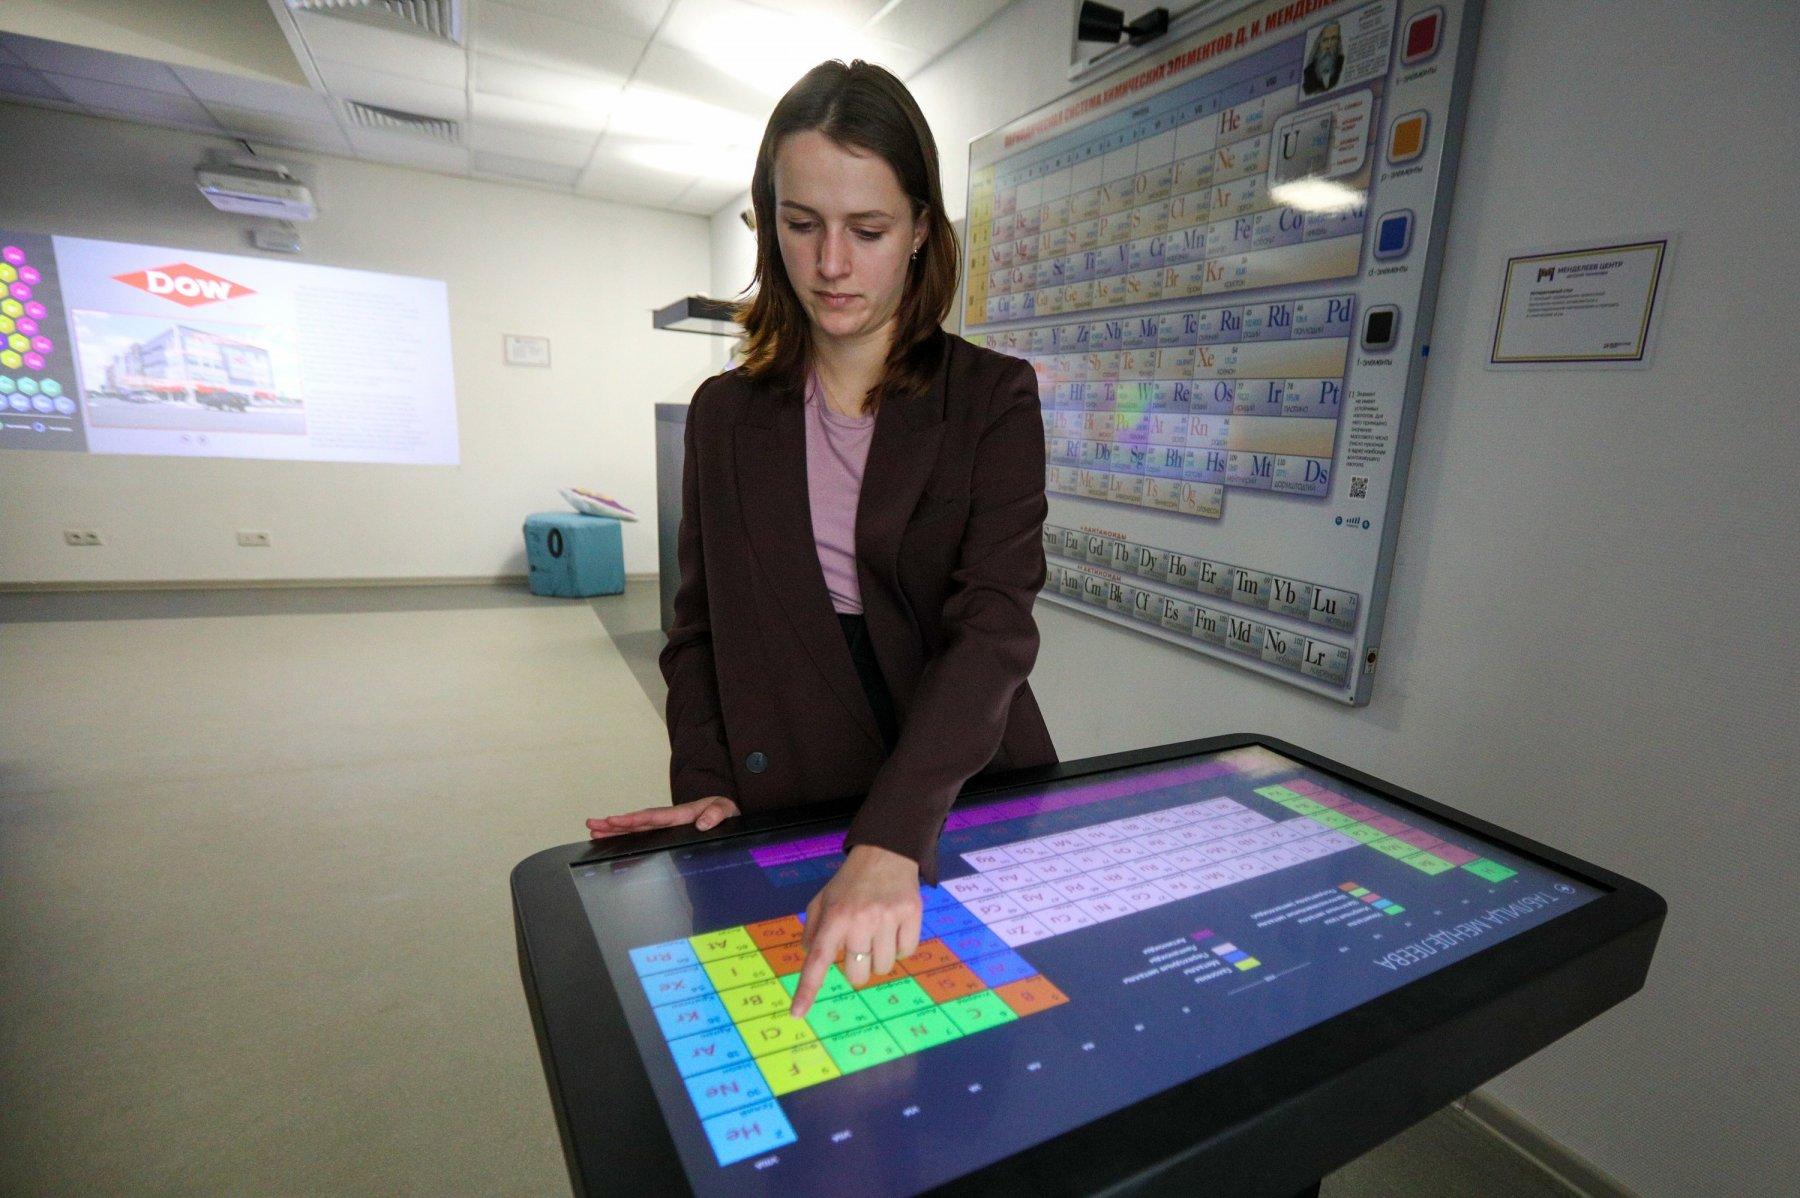 Детские технопарки Москвы объединила своя онлайн-площадка